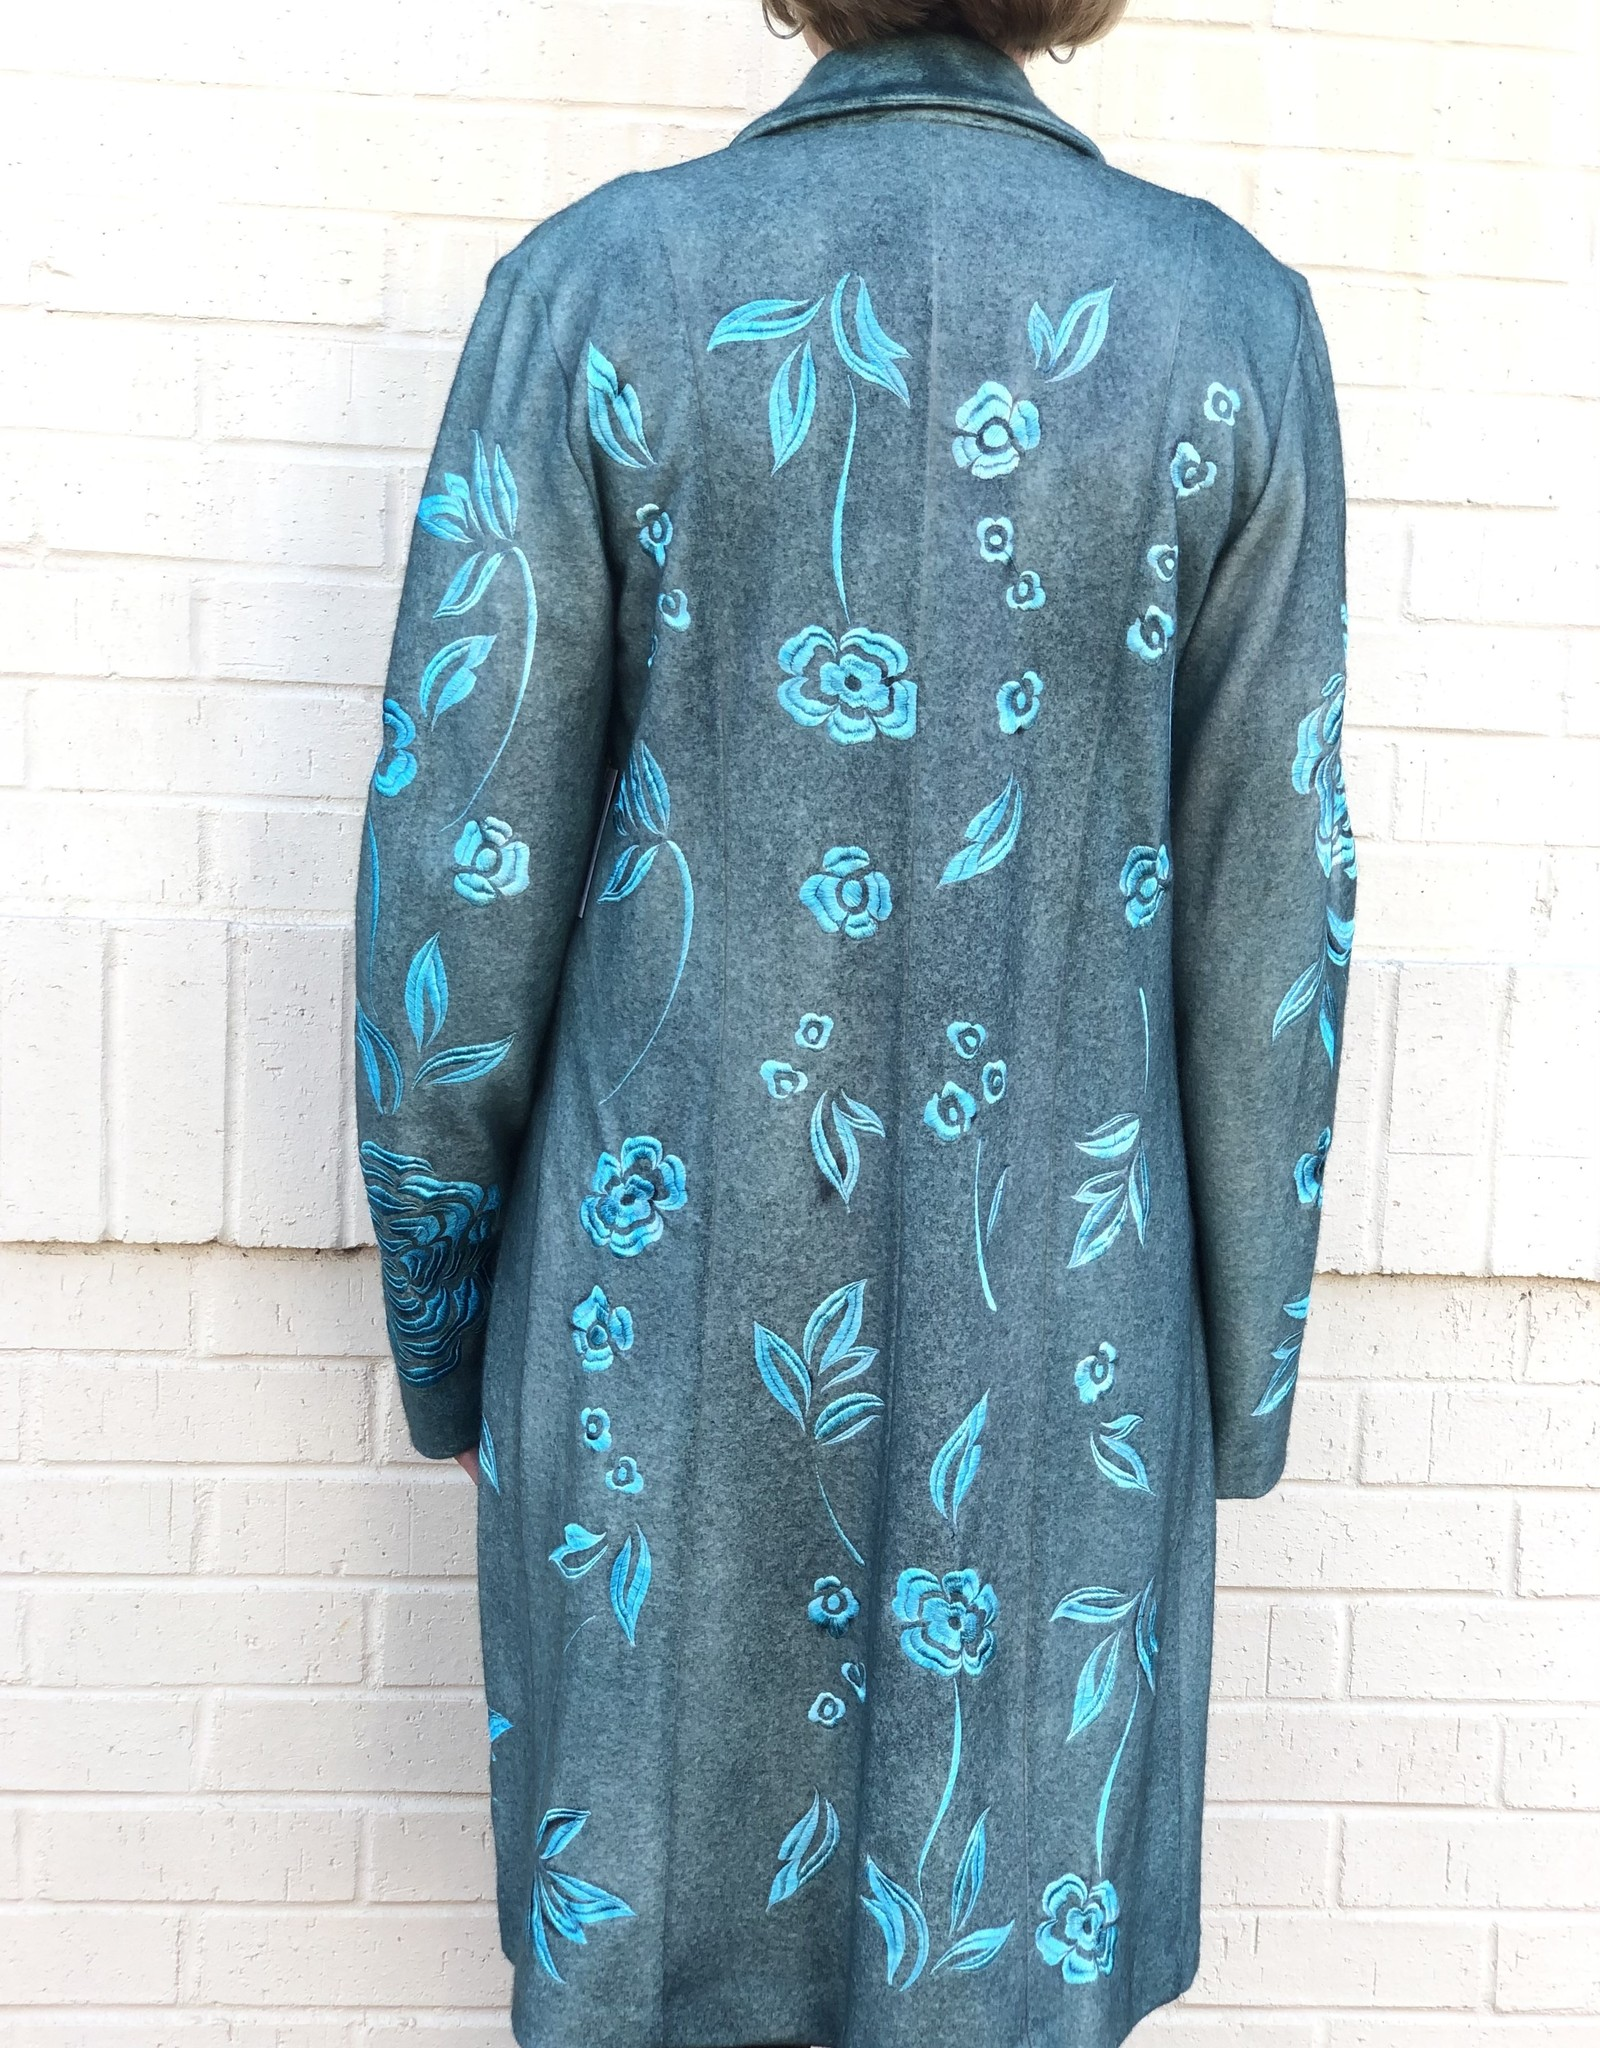 AVANT TOI - Embroidered Coat